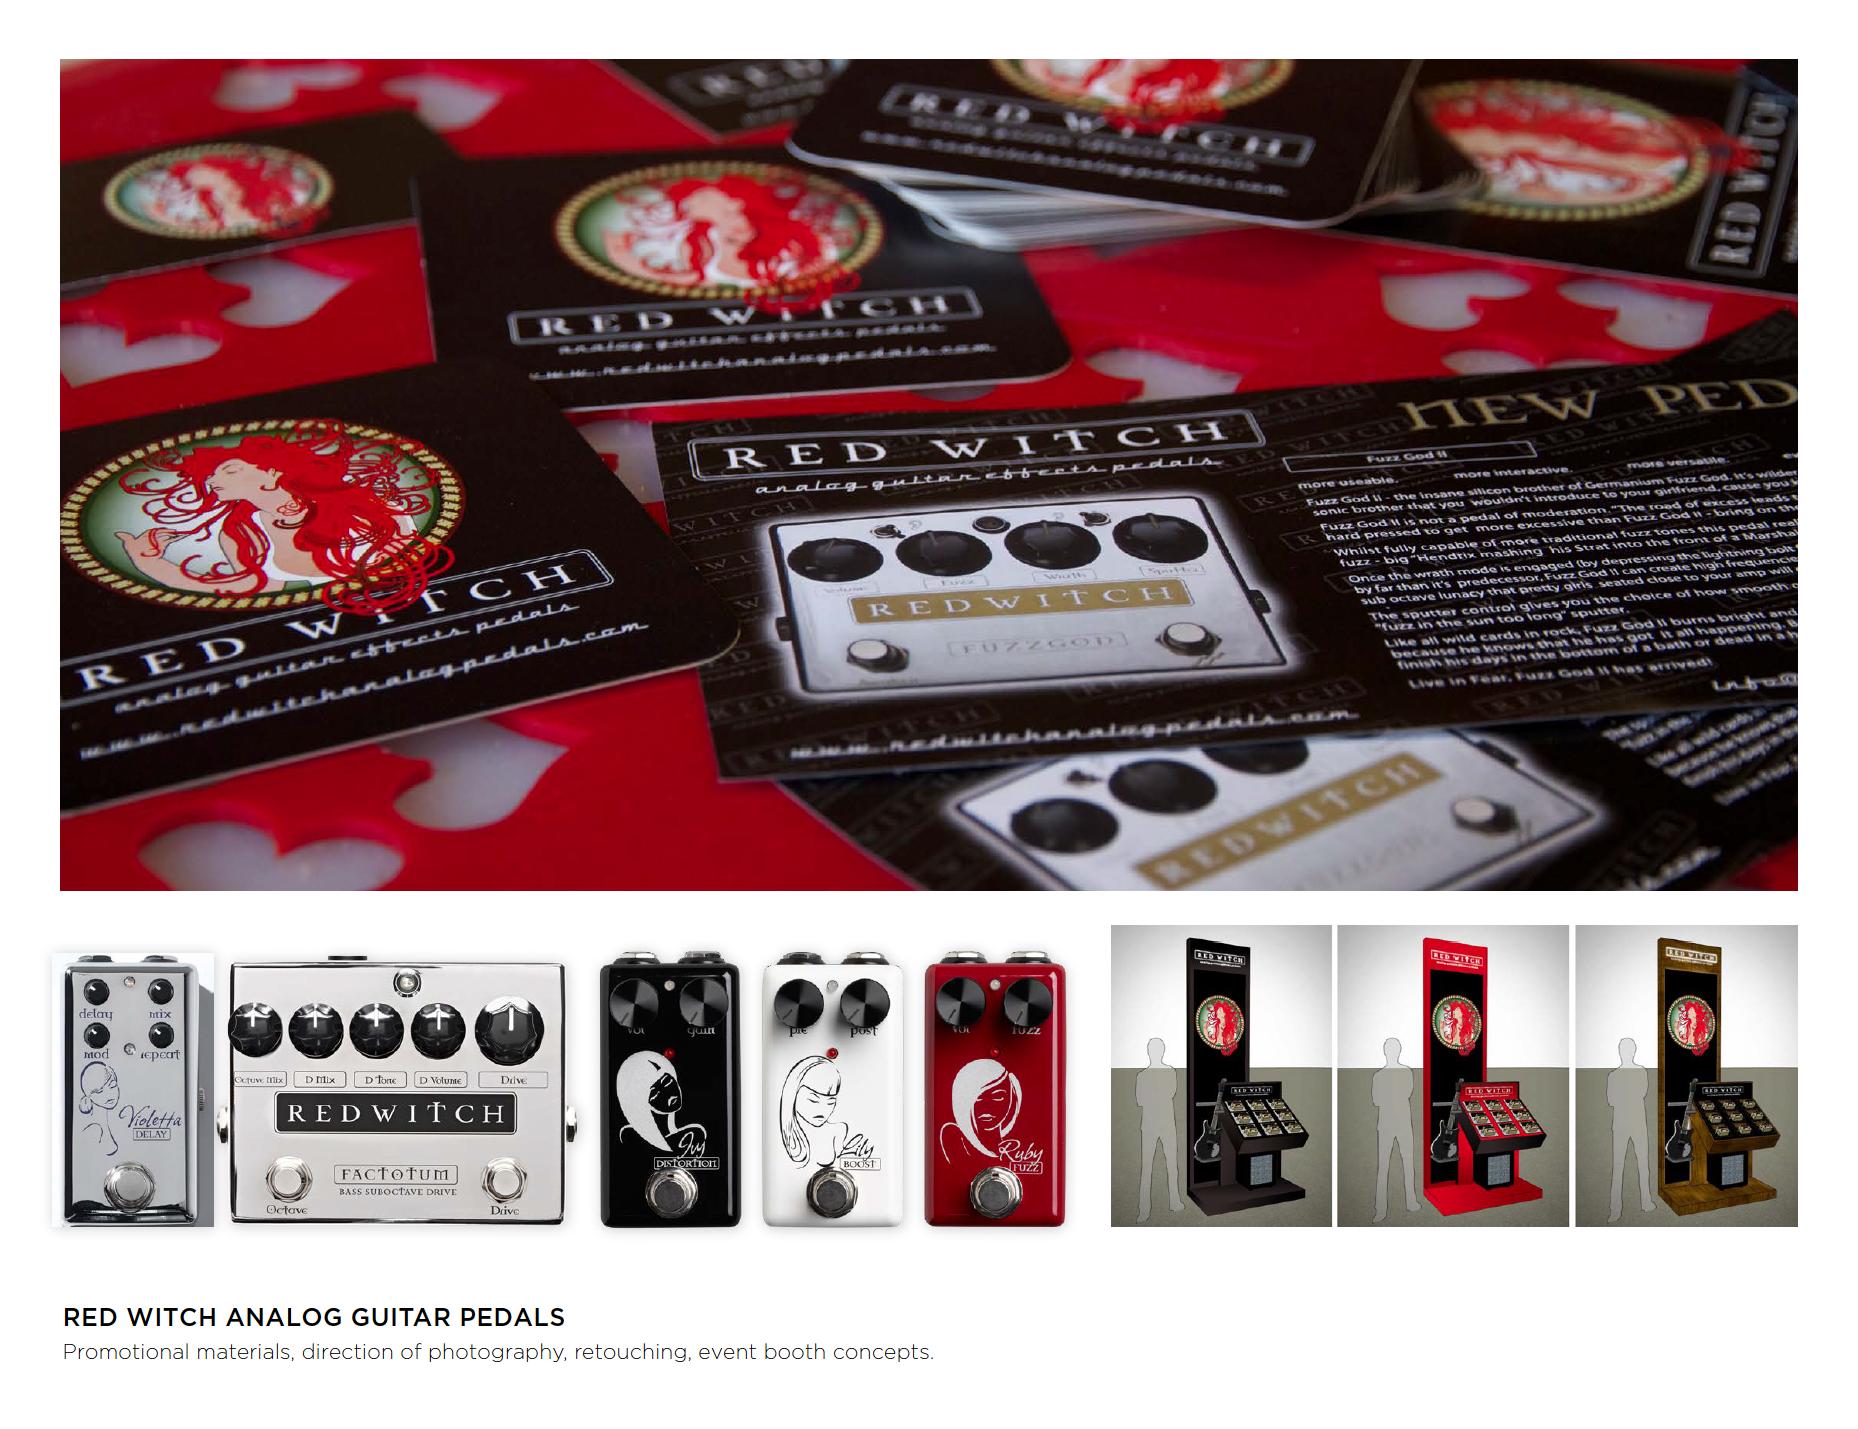 Red Witch Analog Guitar Pedals  - Klara Sadlova